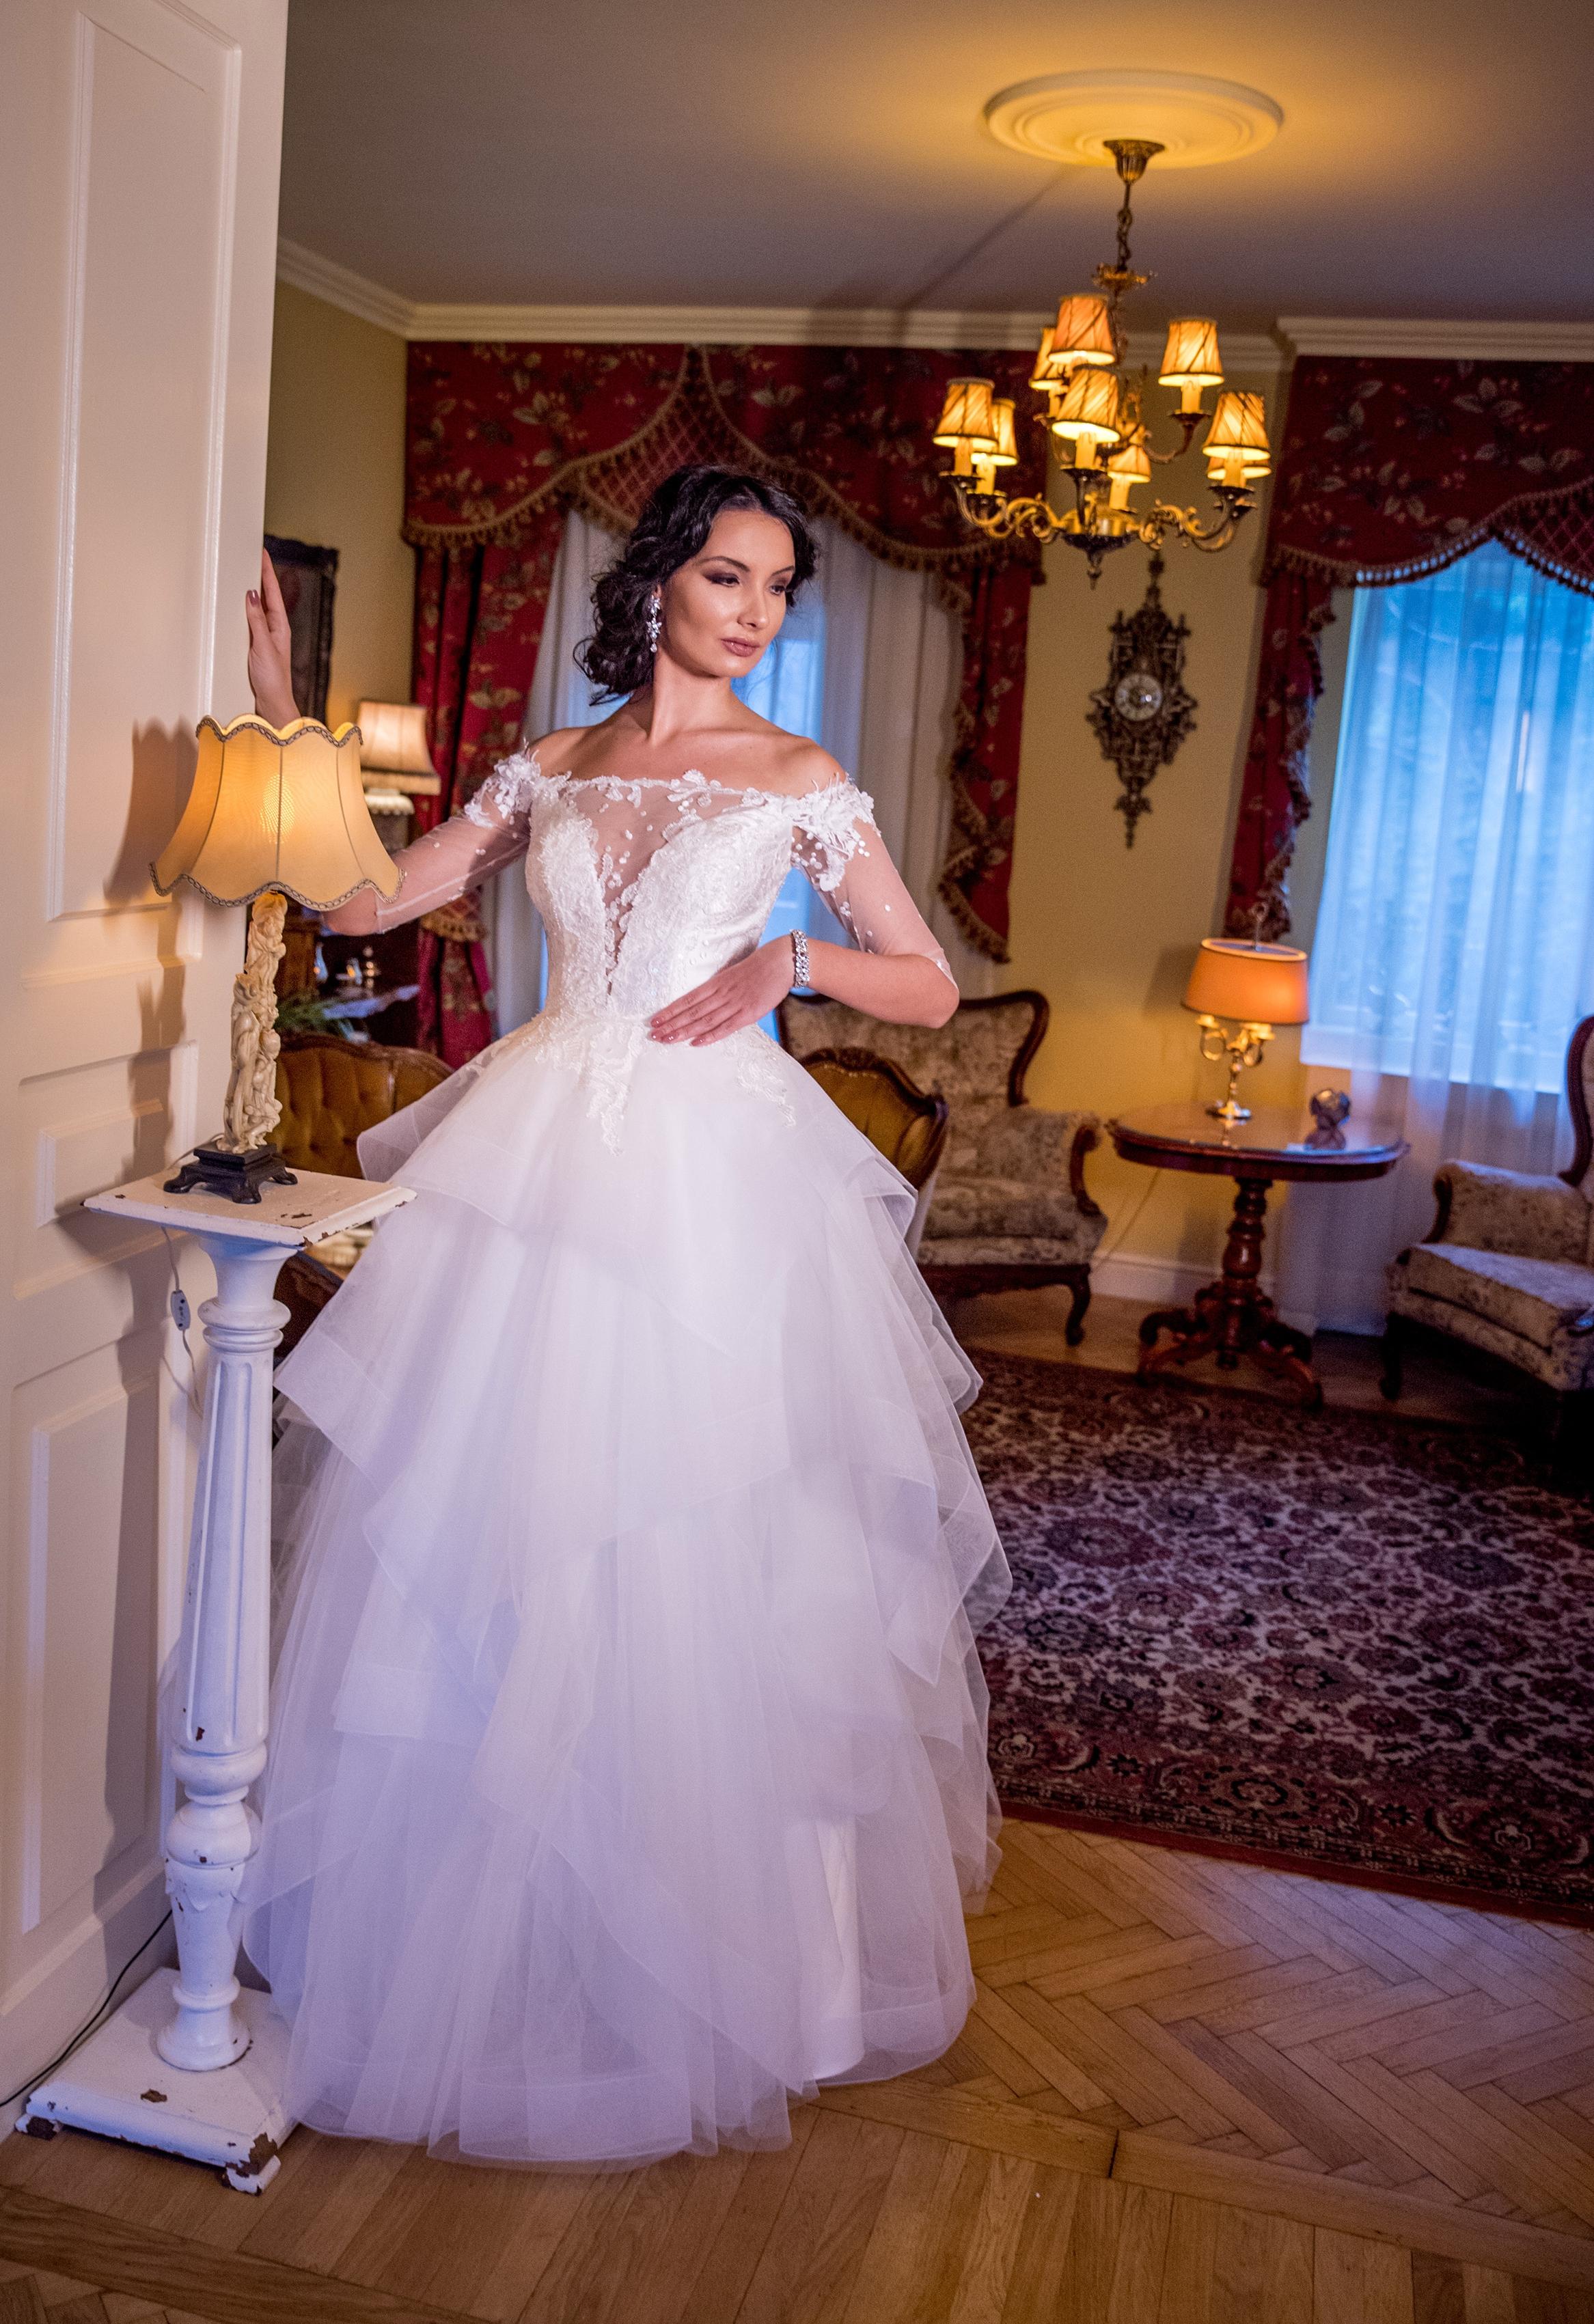 2018 wedding dresses fashion by laina (60).jpg